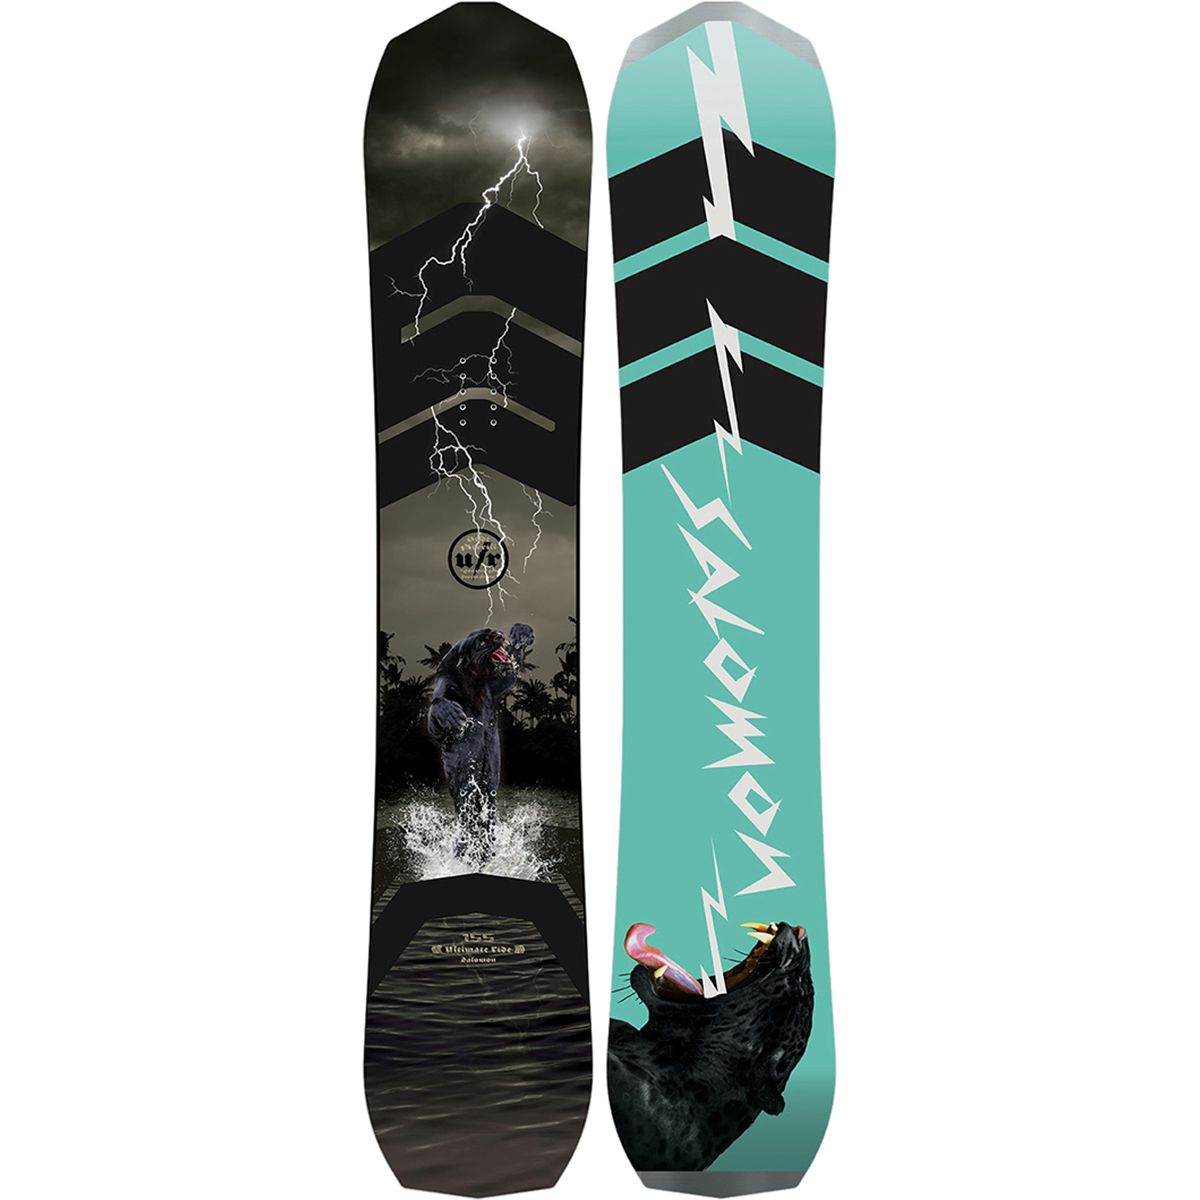 Salomon Snowboards Ultimate Ride Snowboard One Color, 150cm SAL01FK-ONECOL-S150CM